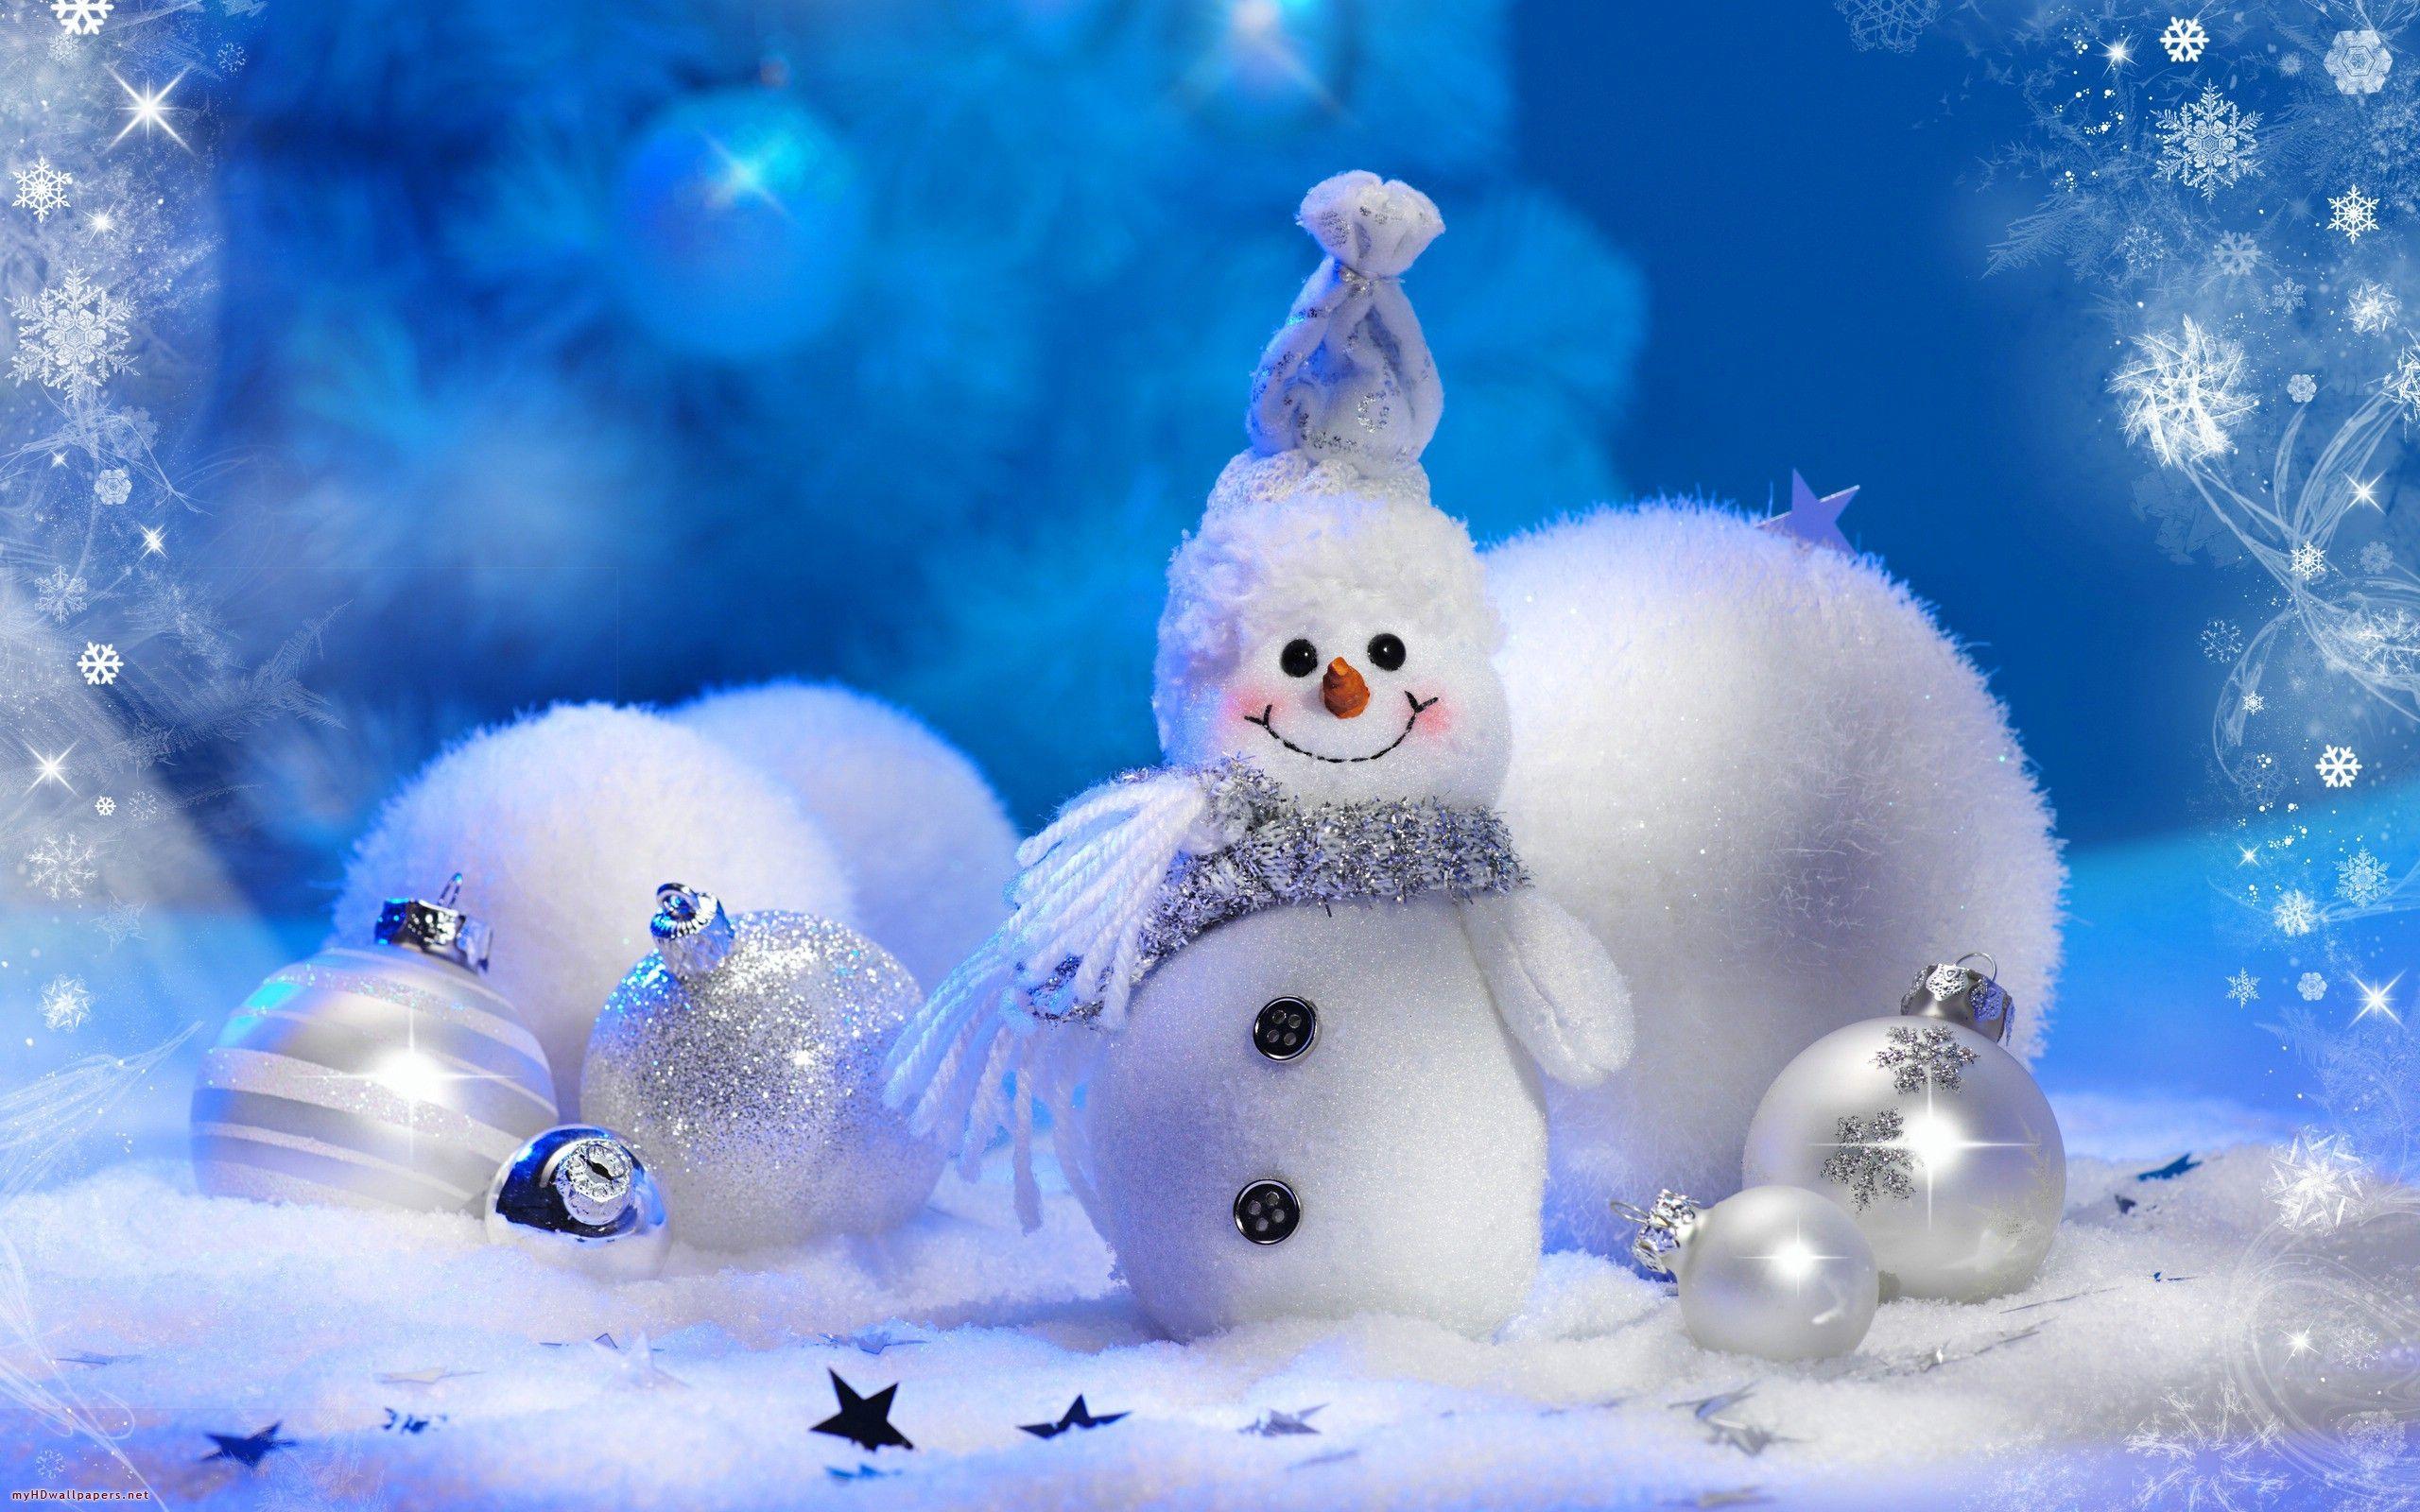 Best Snowman Merry Christmas Hd Wallpapers Animated Christmas Wallpaper Christmas Wallpaper Backgrounds Snowman Christmas Decorations